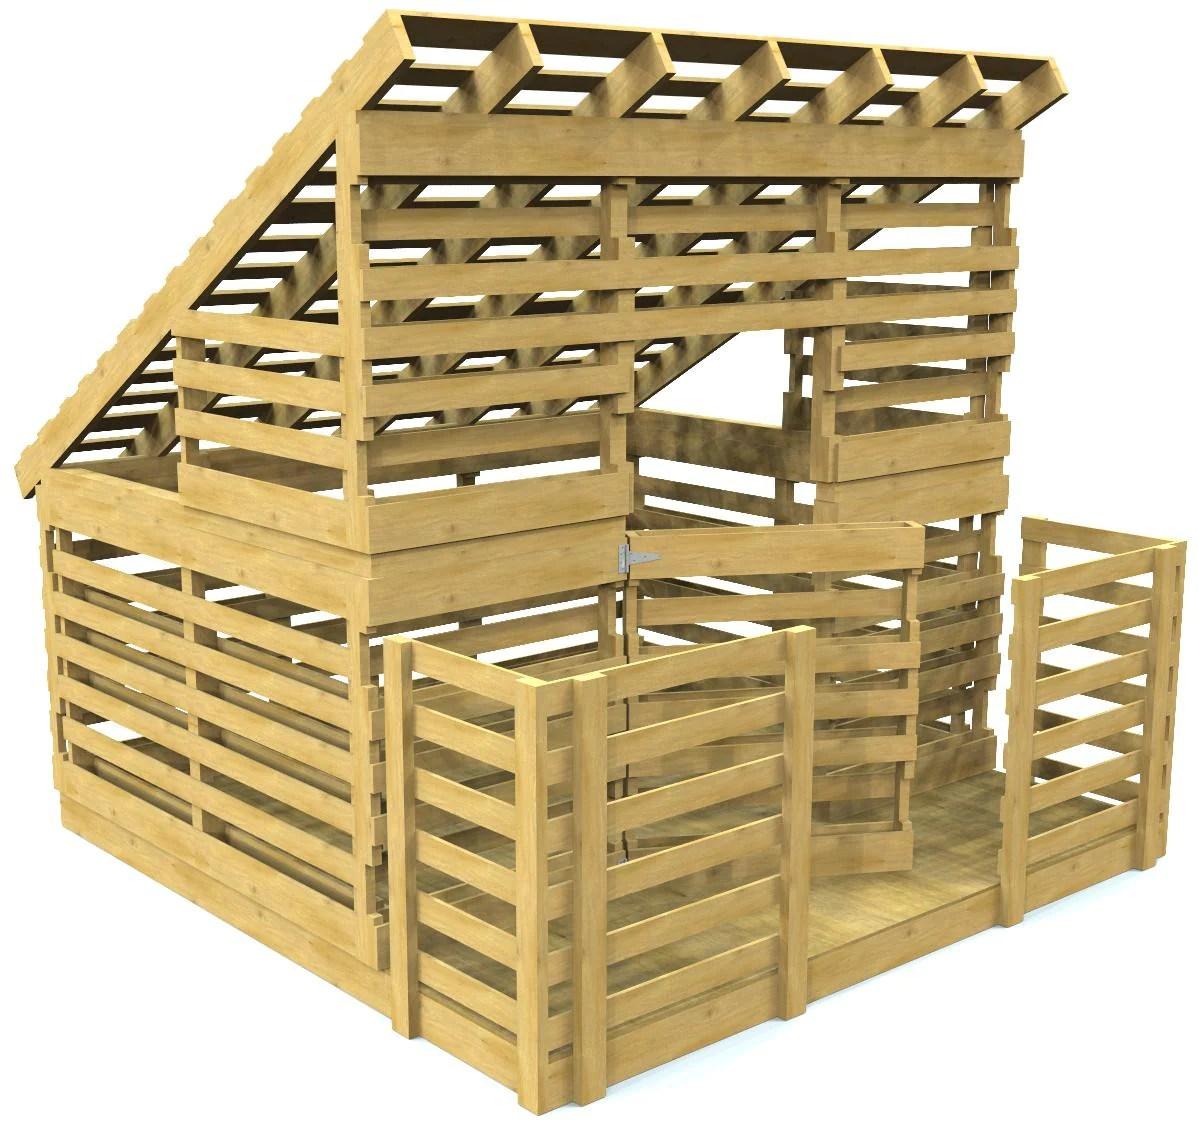 Paul S Pallet Playhouse Free Diy Woodworking Plan Paul